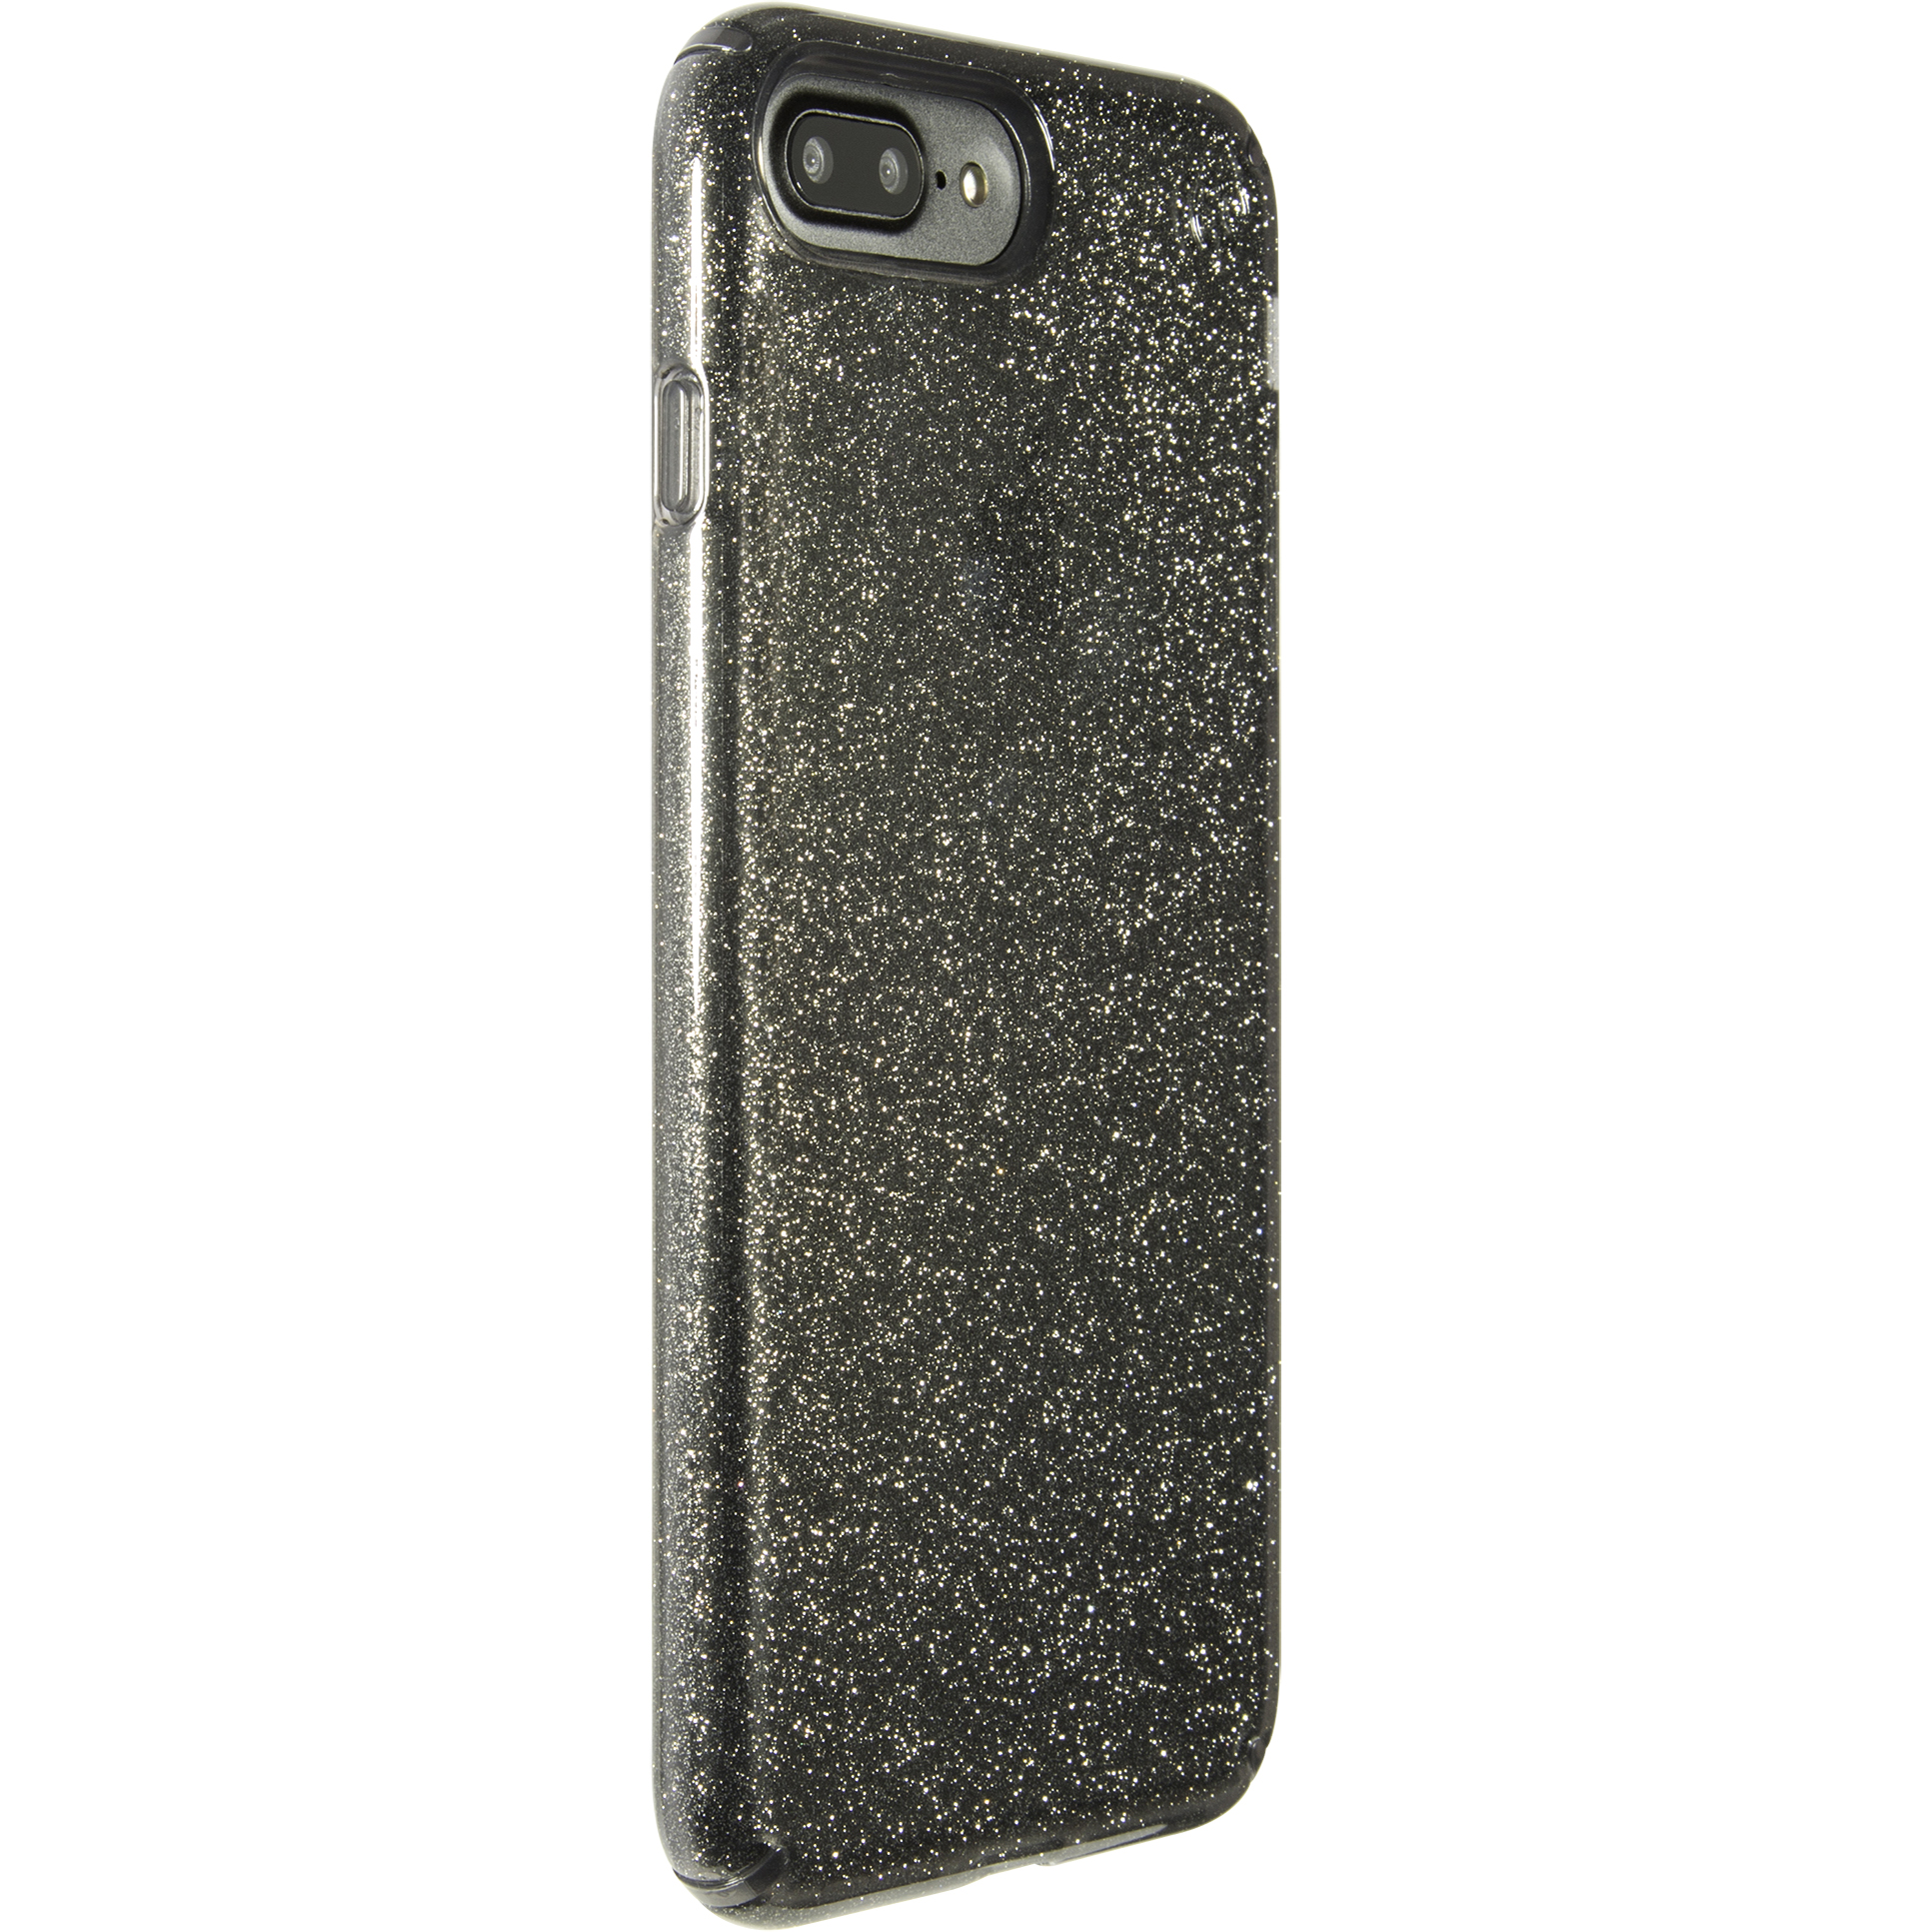 Speck Presidio Clearglitter Case Iphone 7 Plus 8 Plus Black Gold Glitter